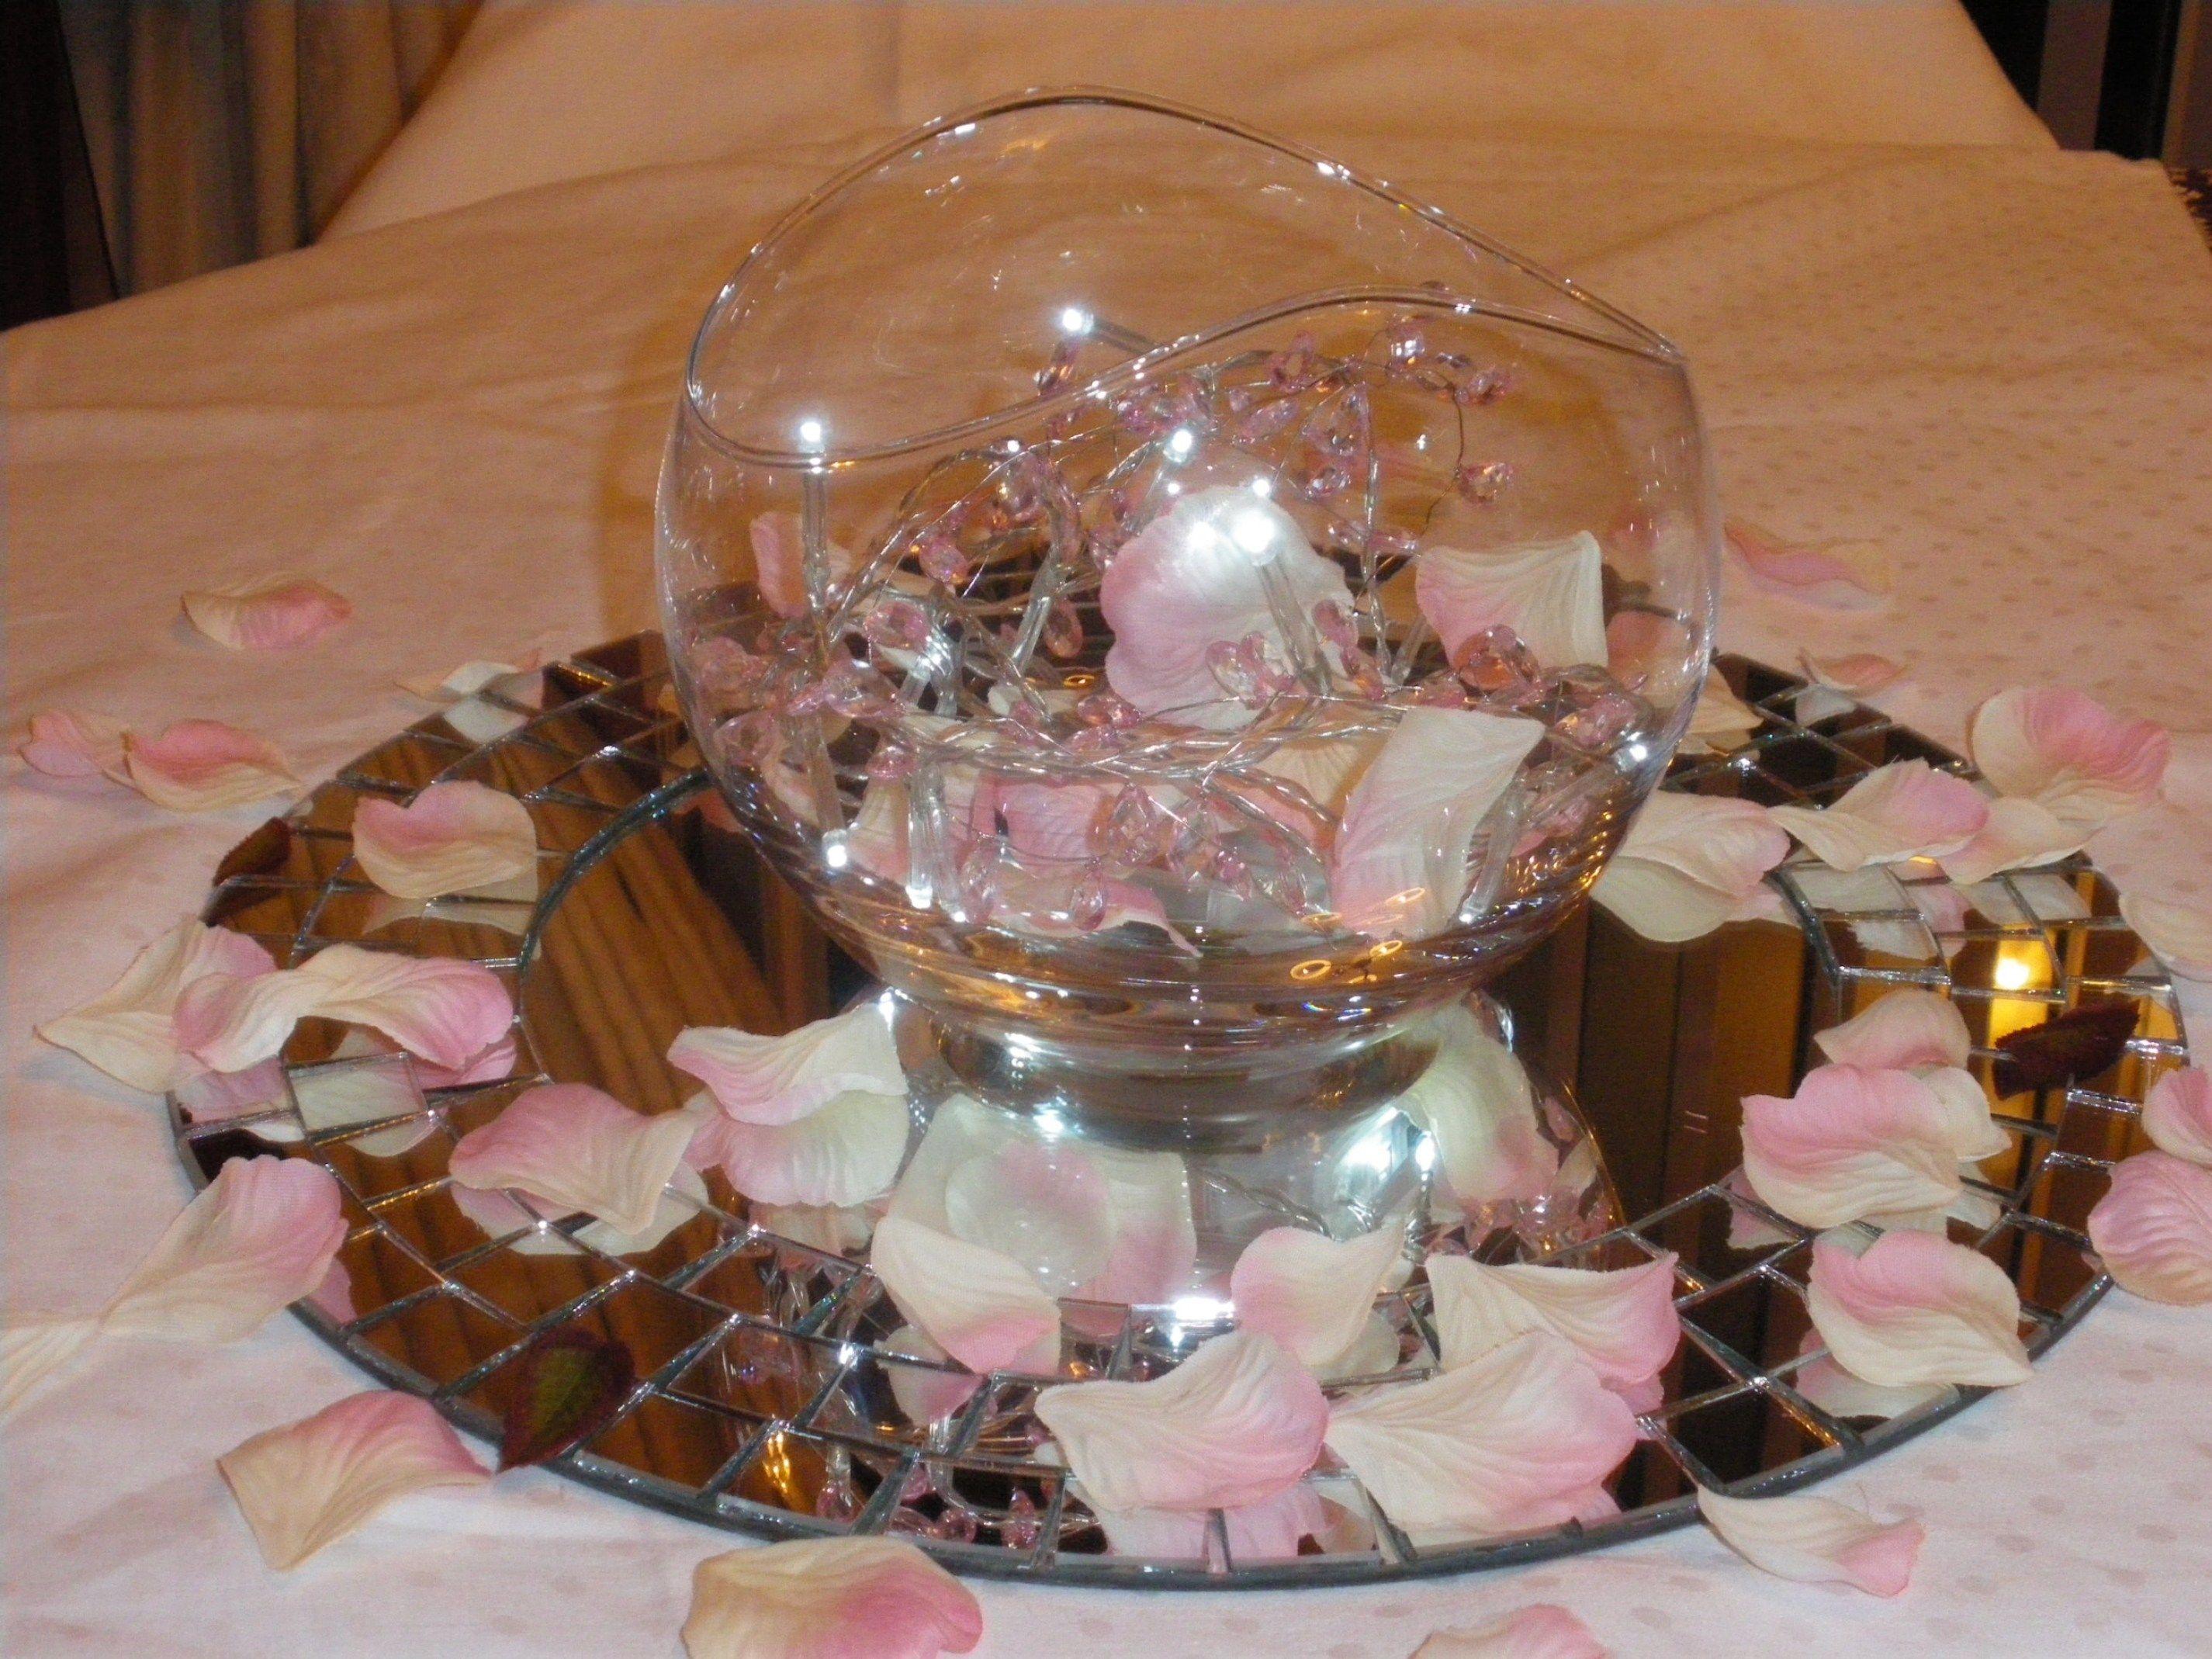 30 amazing decorative fish bowls for wedding tables wedding rh pinterest com